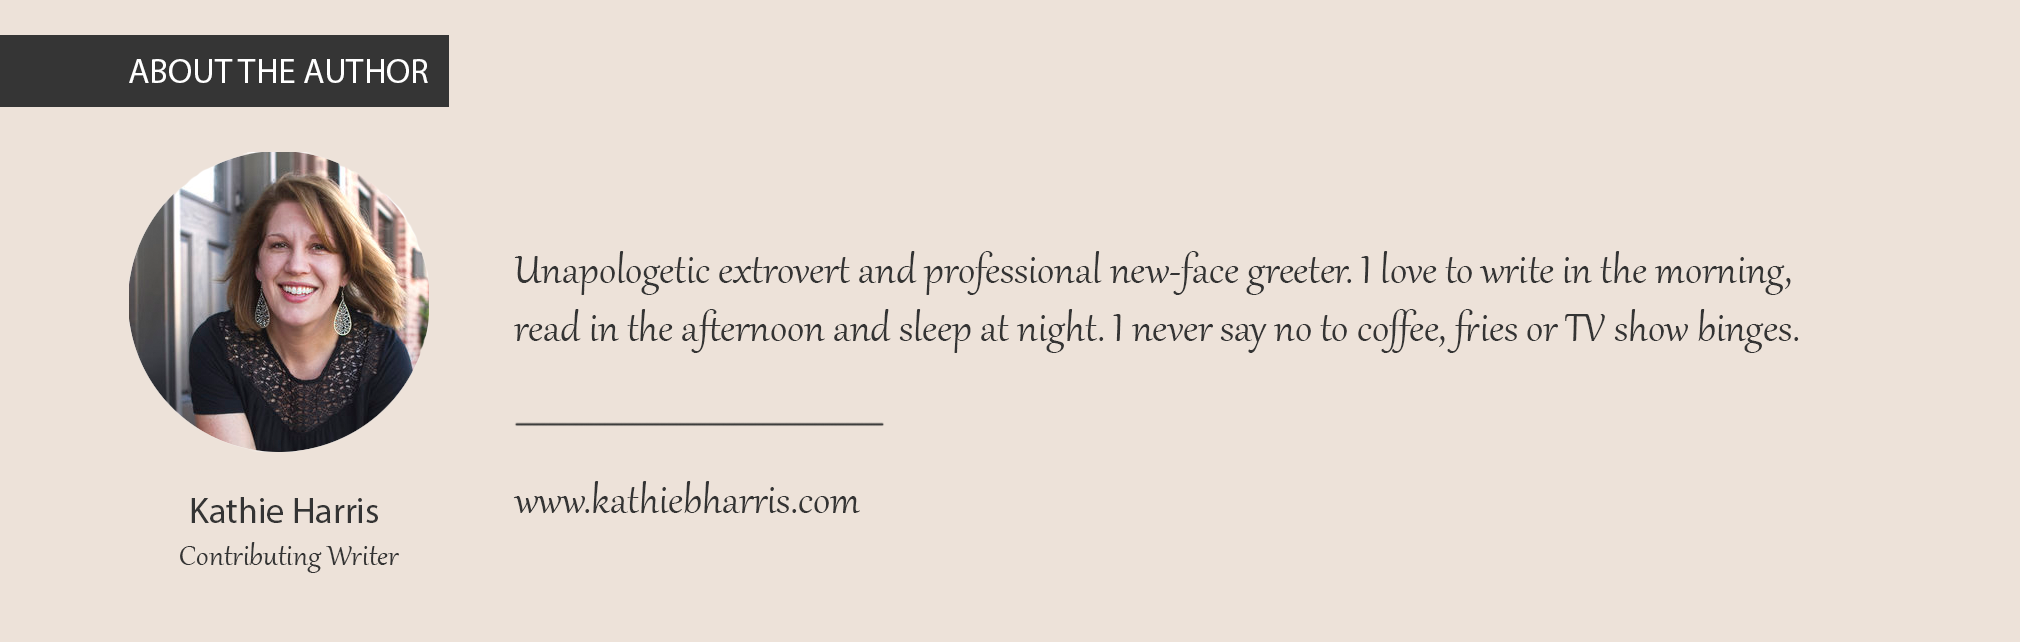 Kathie Harris bio.png